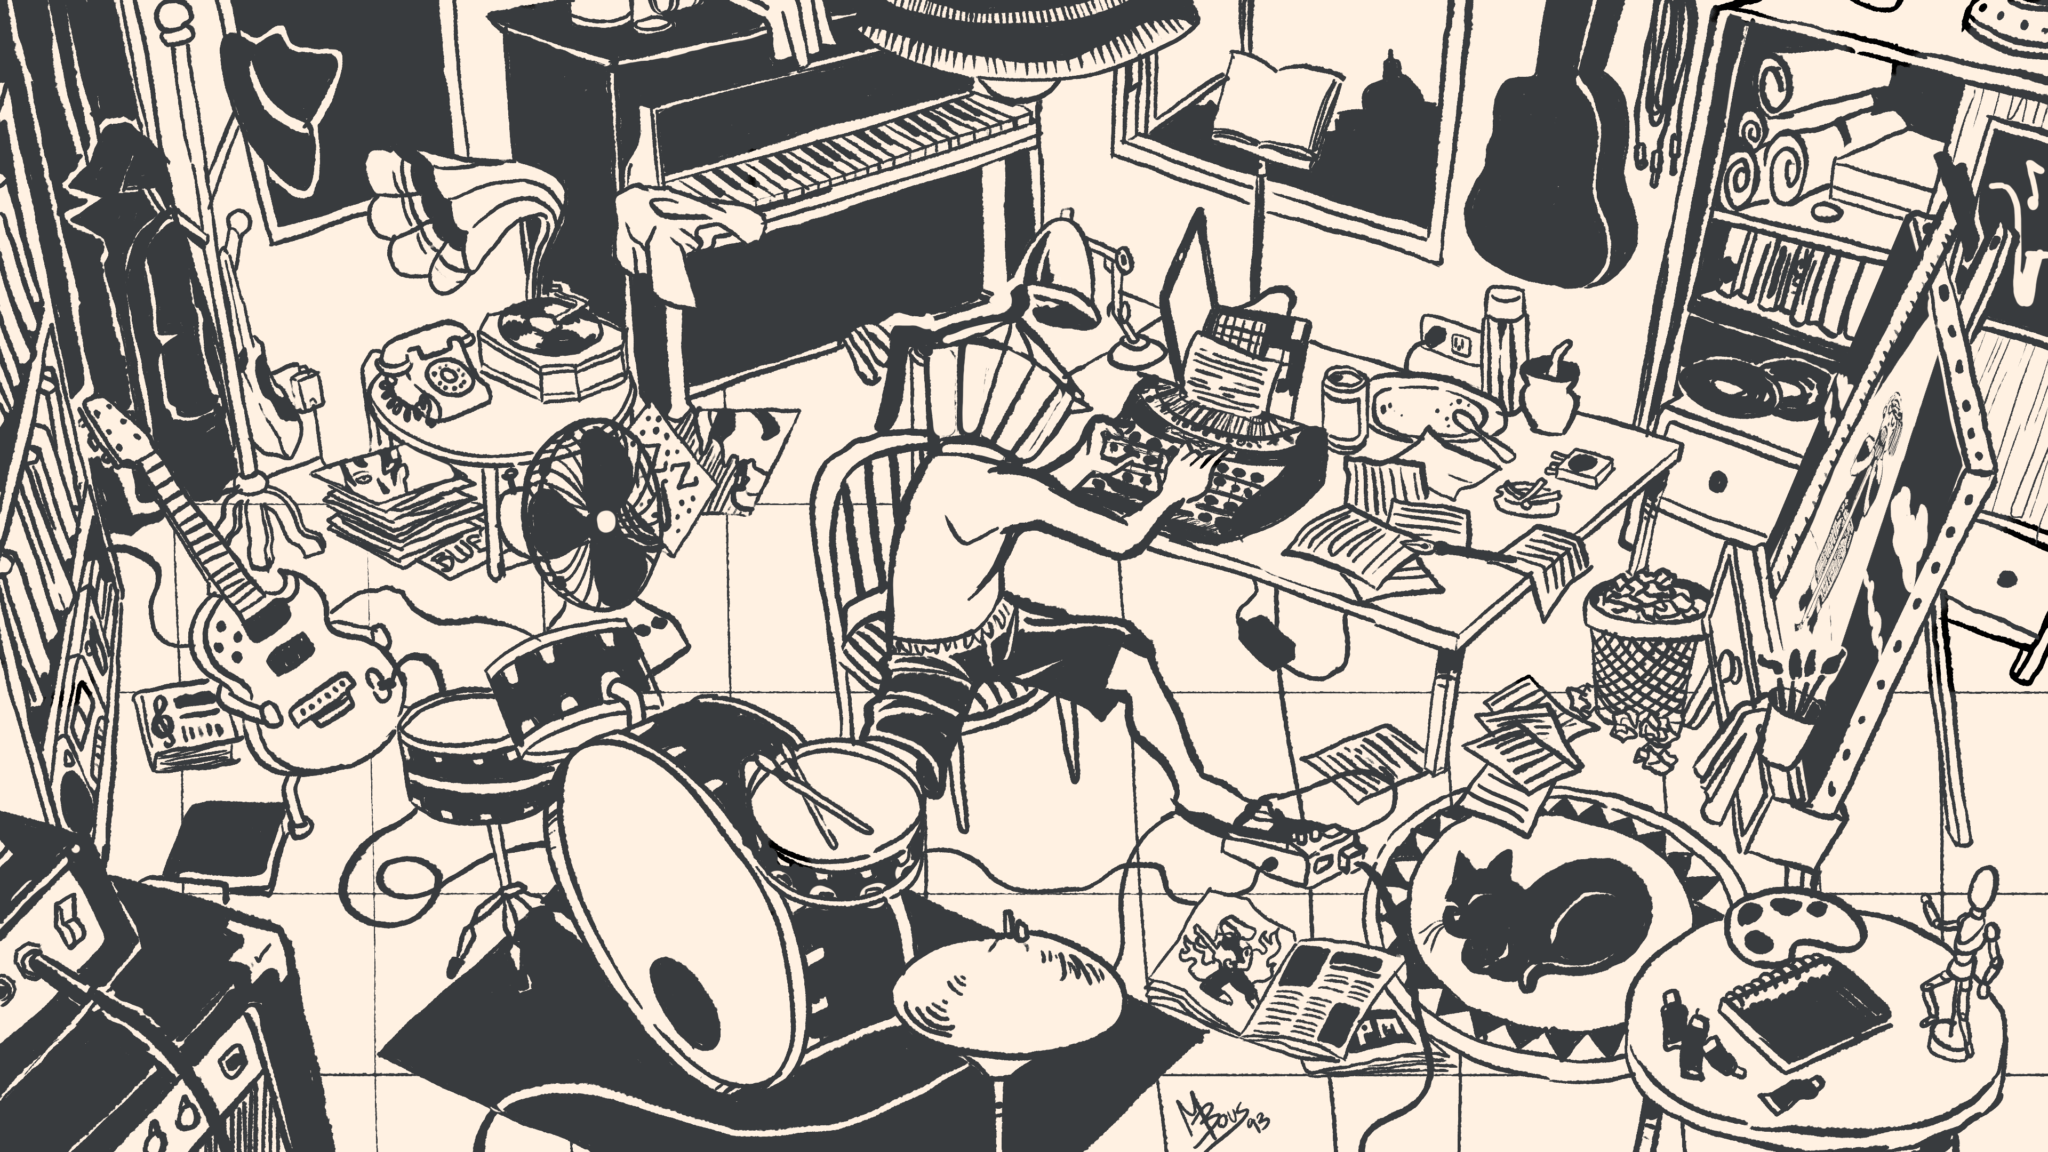 Musical Office Illustration: Mayo Bous